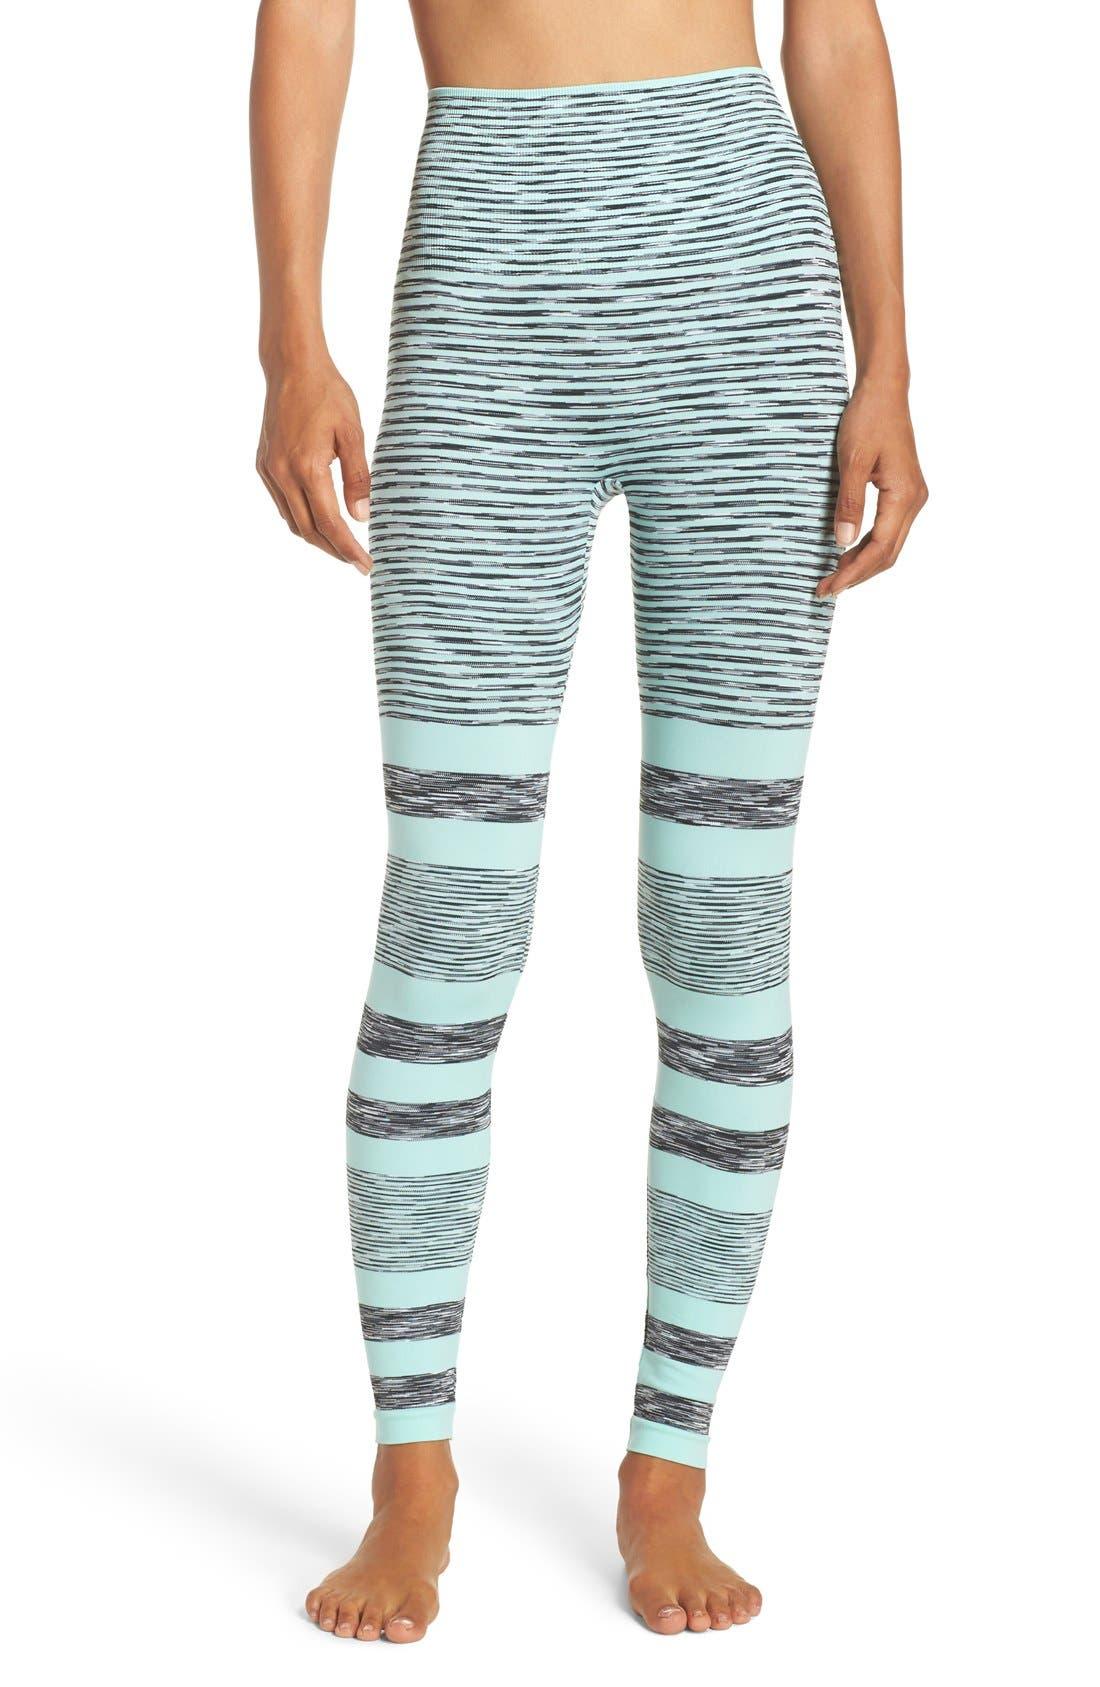 Alternate Image 1 Selected - Climawear 'Raise the Bar' High Waist Seamless Leggings